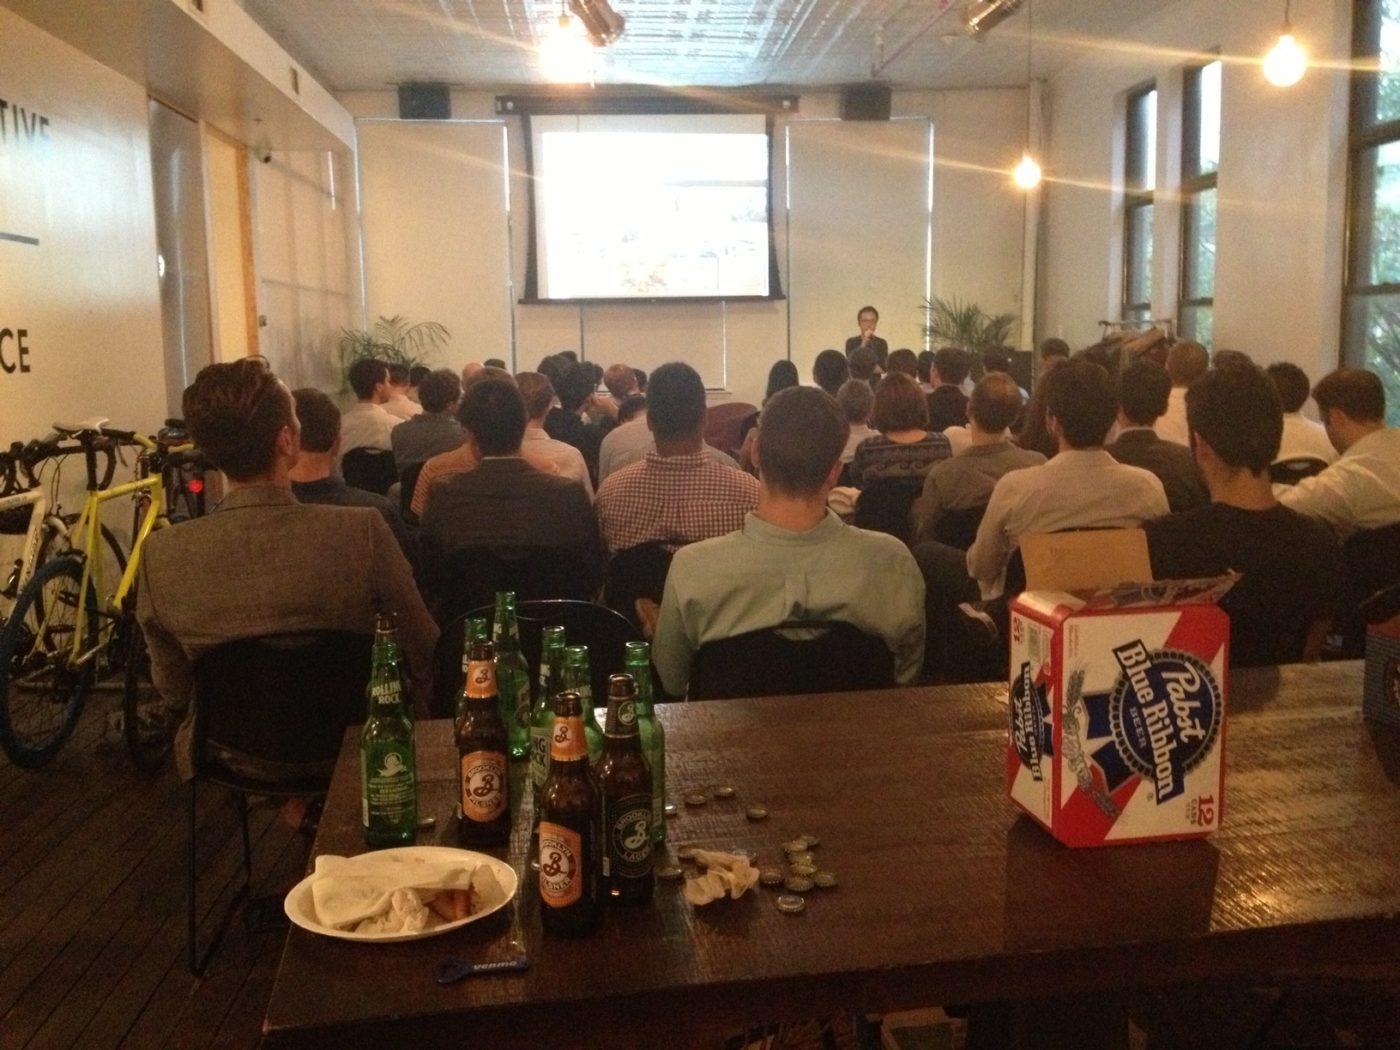 Popular NYC startup event reveals burgeoning RE tech scene